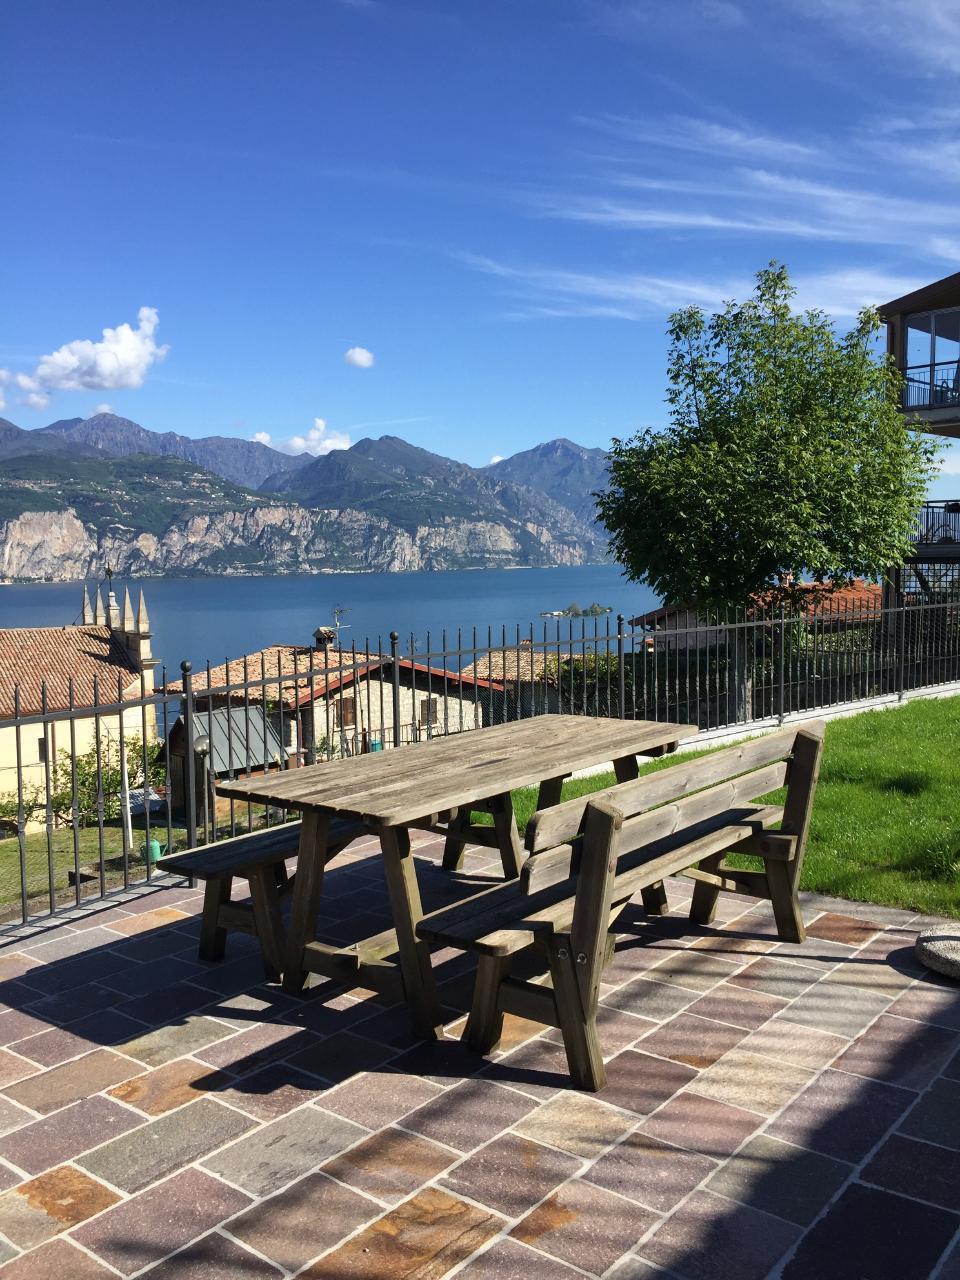 Casa Mary Wohnung n. 2 mit Seeblick   Gardasee - Lago di Garda